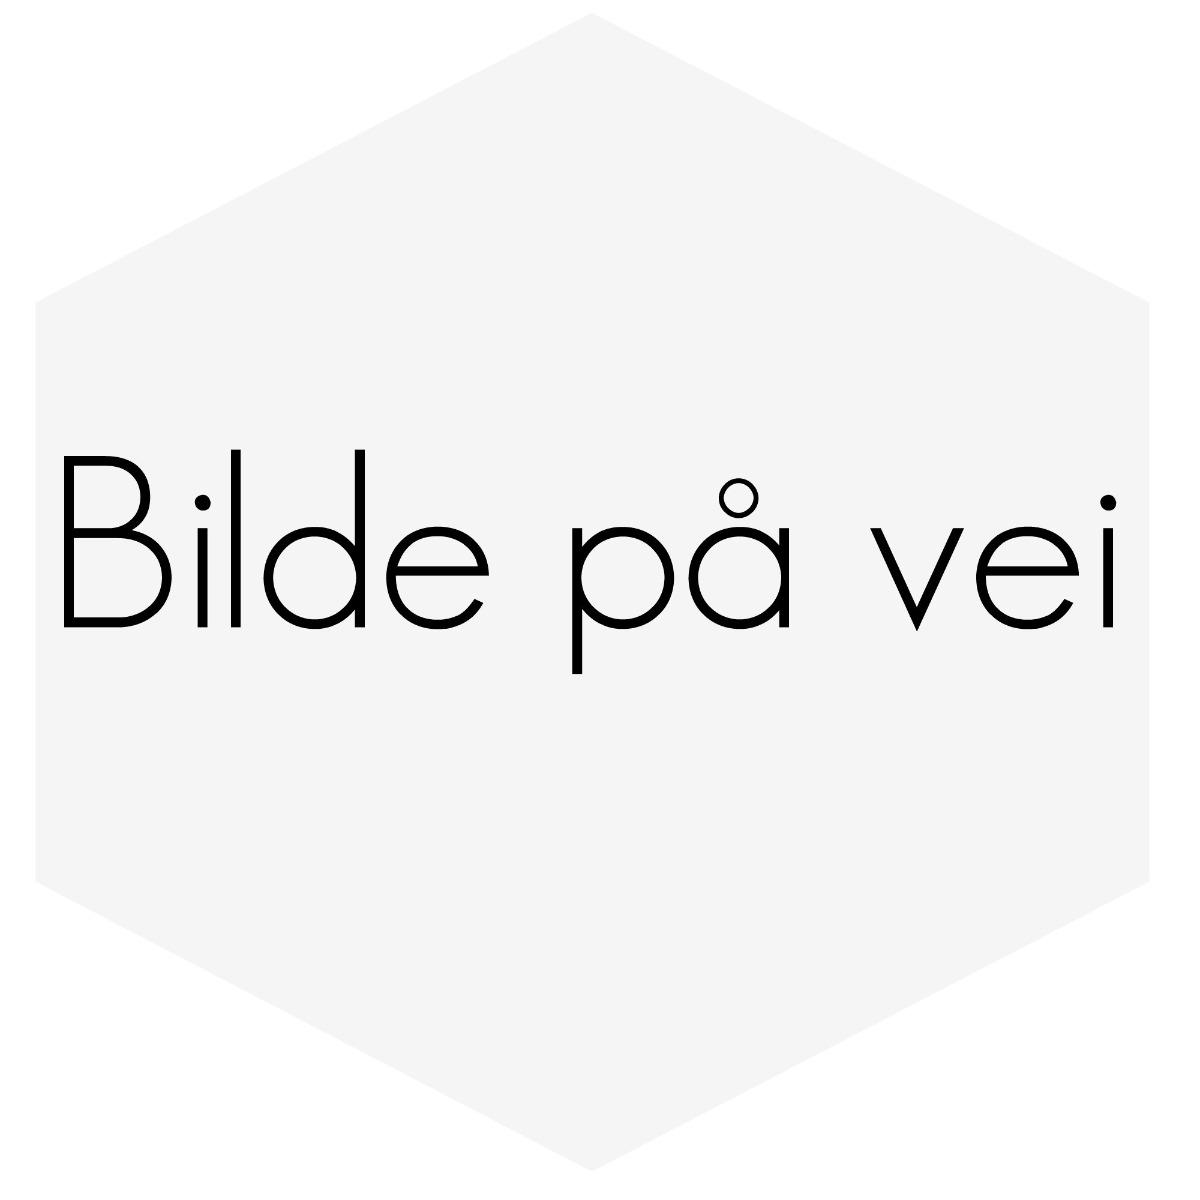 "SILIKONSLANGE DESIMETERVARE BLÅ 0,3125"" (8MM)"